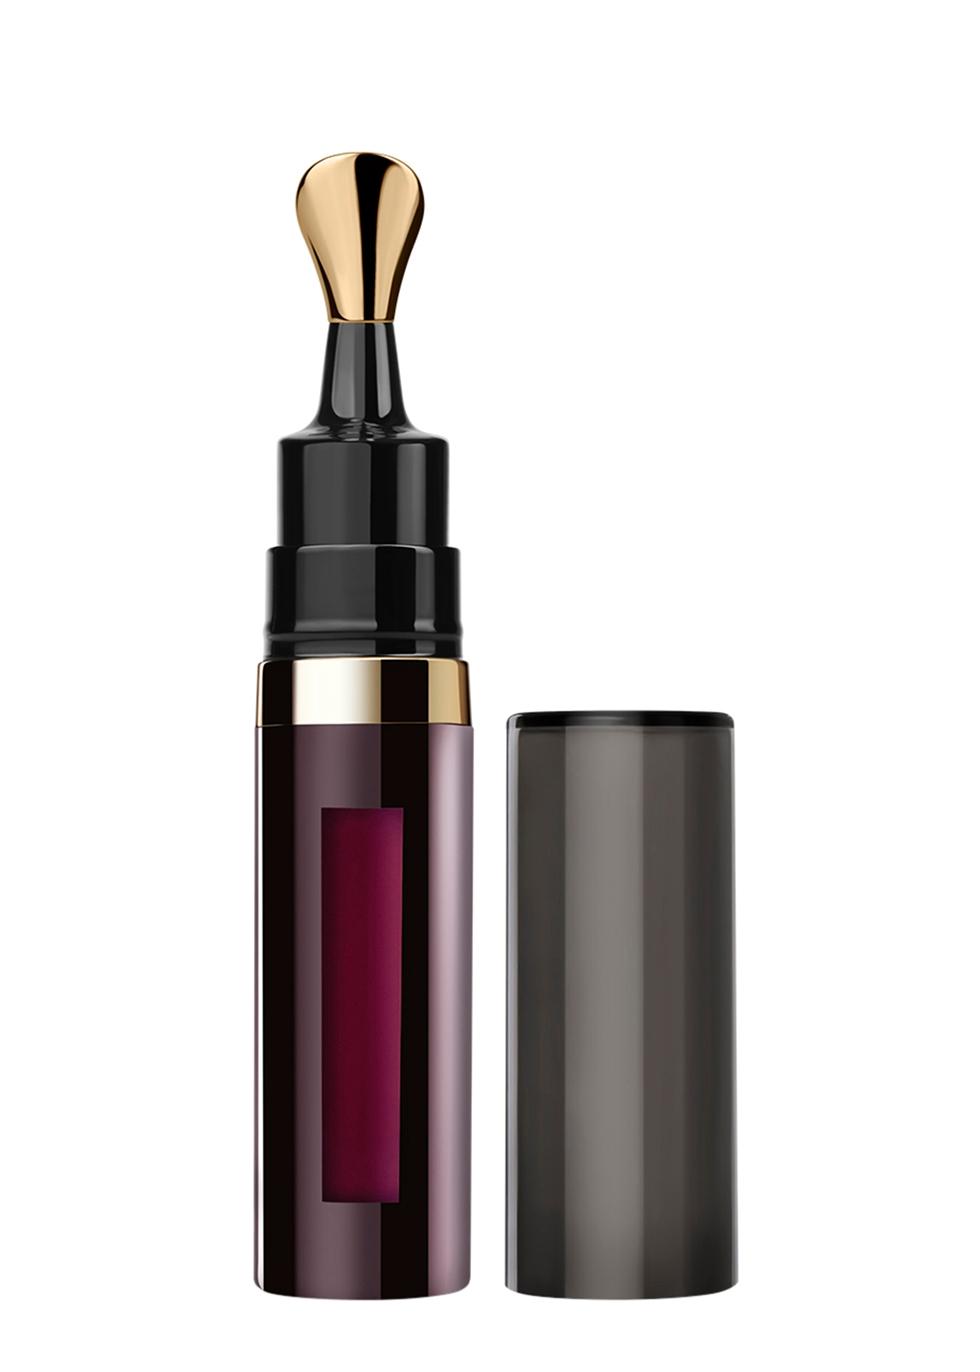 Nº 28™ Lip Treatment Oil - HOURGLASS